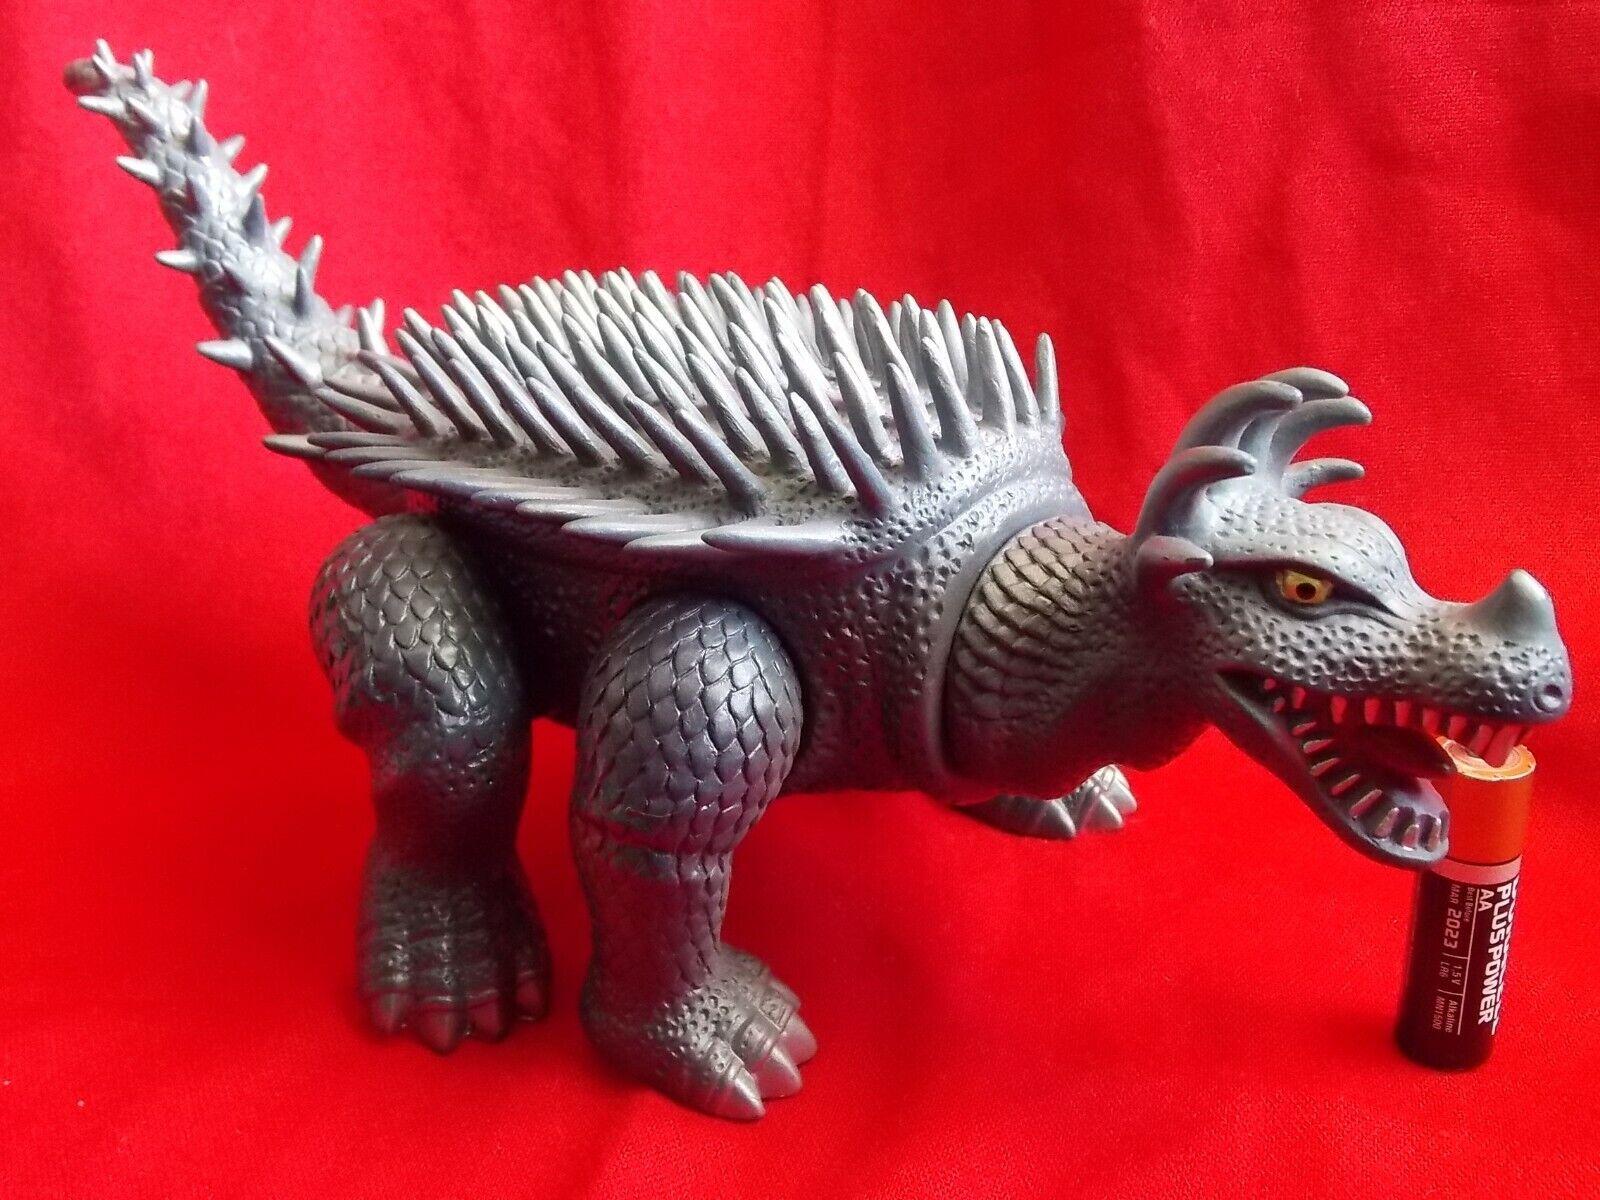 Anguirus Marusan Medicom Juguete 2015 Mancha PVC Figura longitud 12  30cm Godzilla